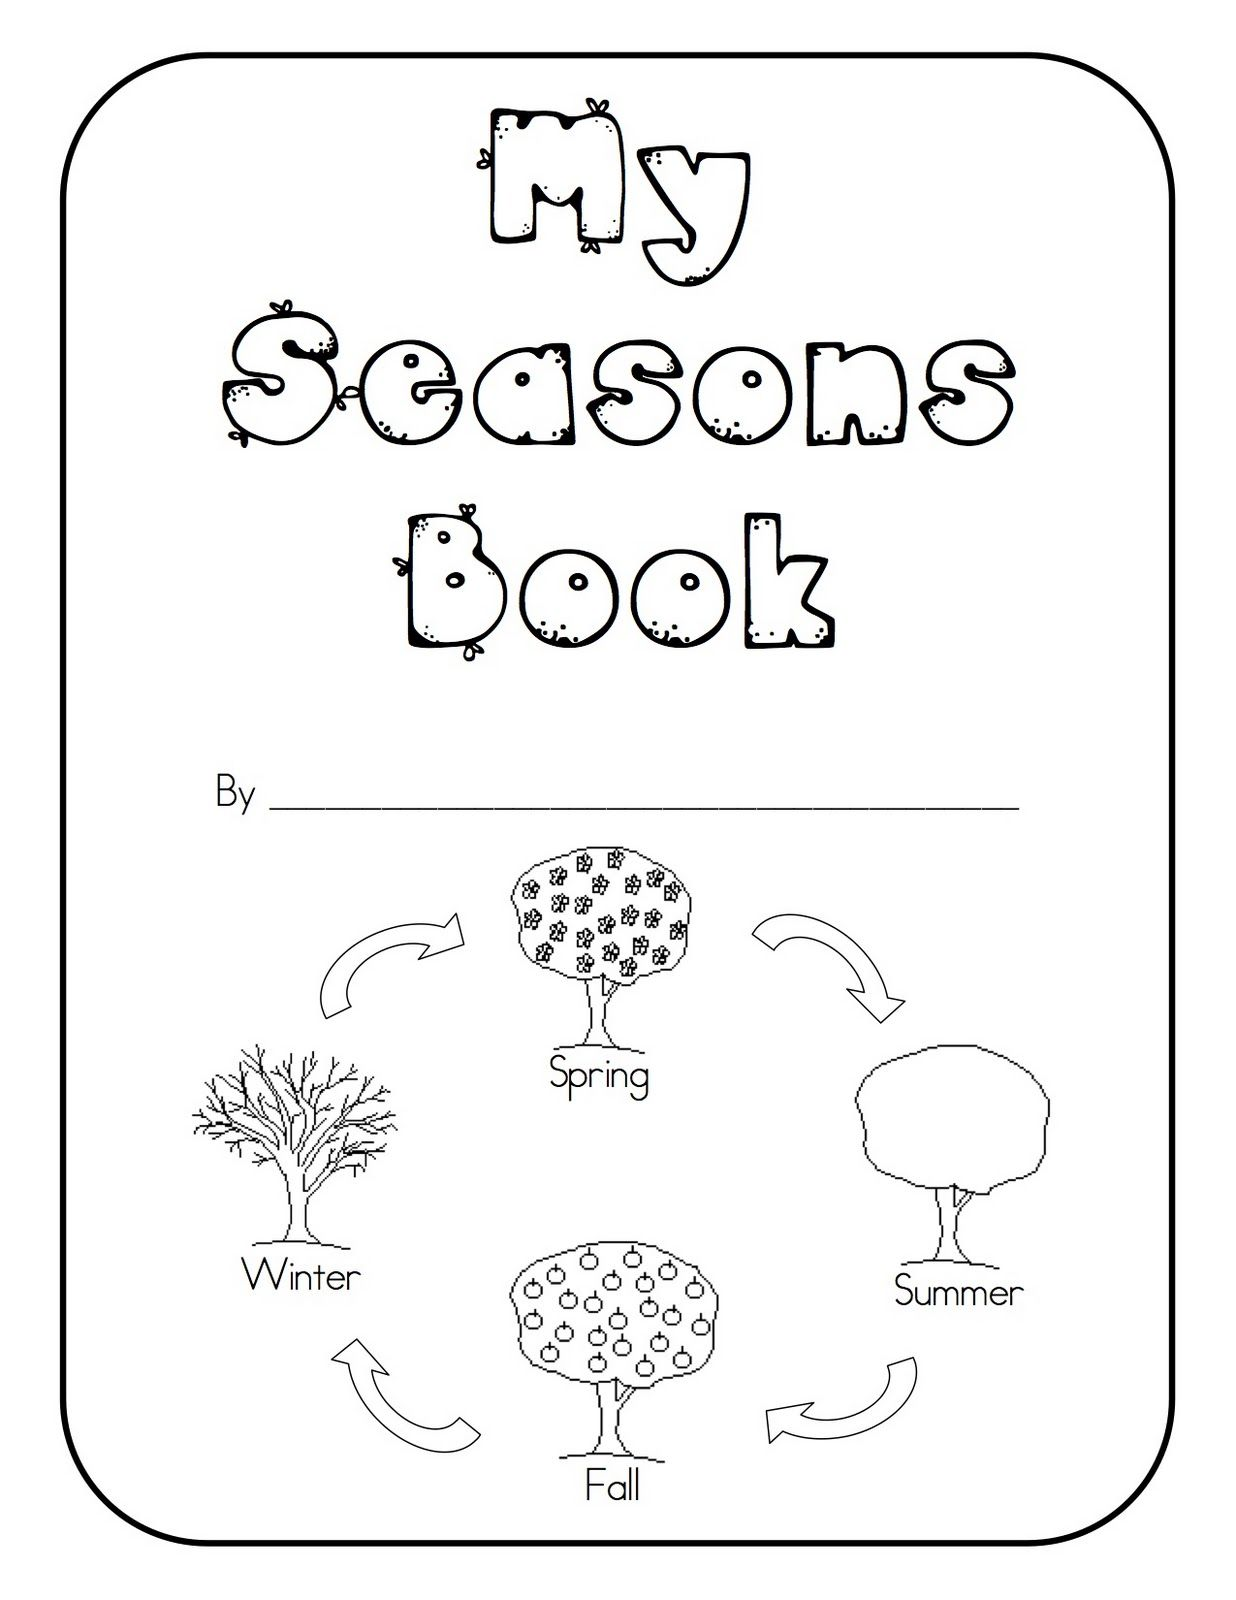 Pin By Kim Rhodes On Classroom Reading Writing Kindergarten Science Kindergarten Books Seasons Kindergarten [ 1600 x 1236 Pixel ]